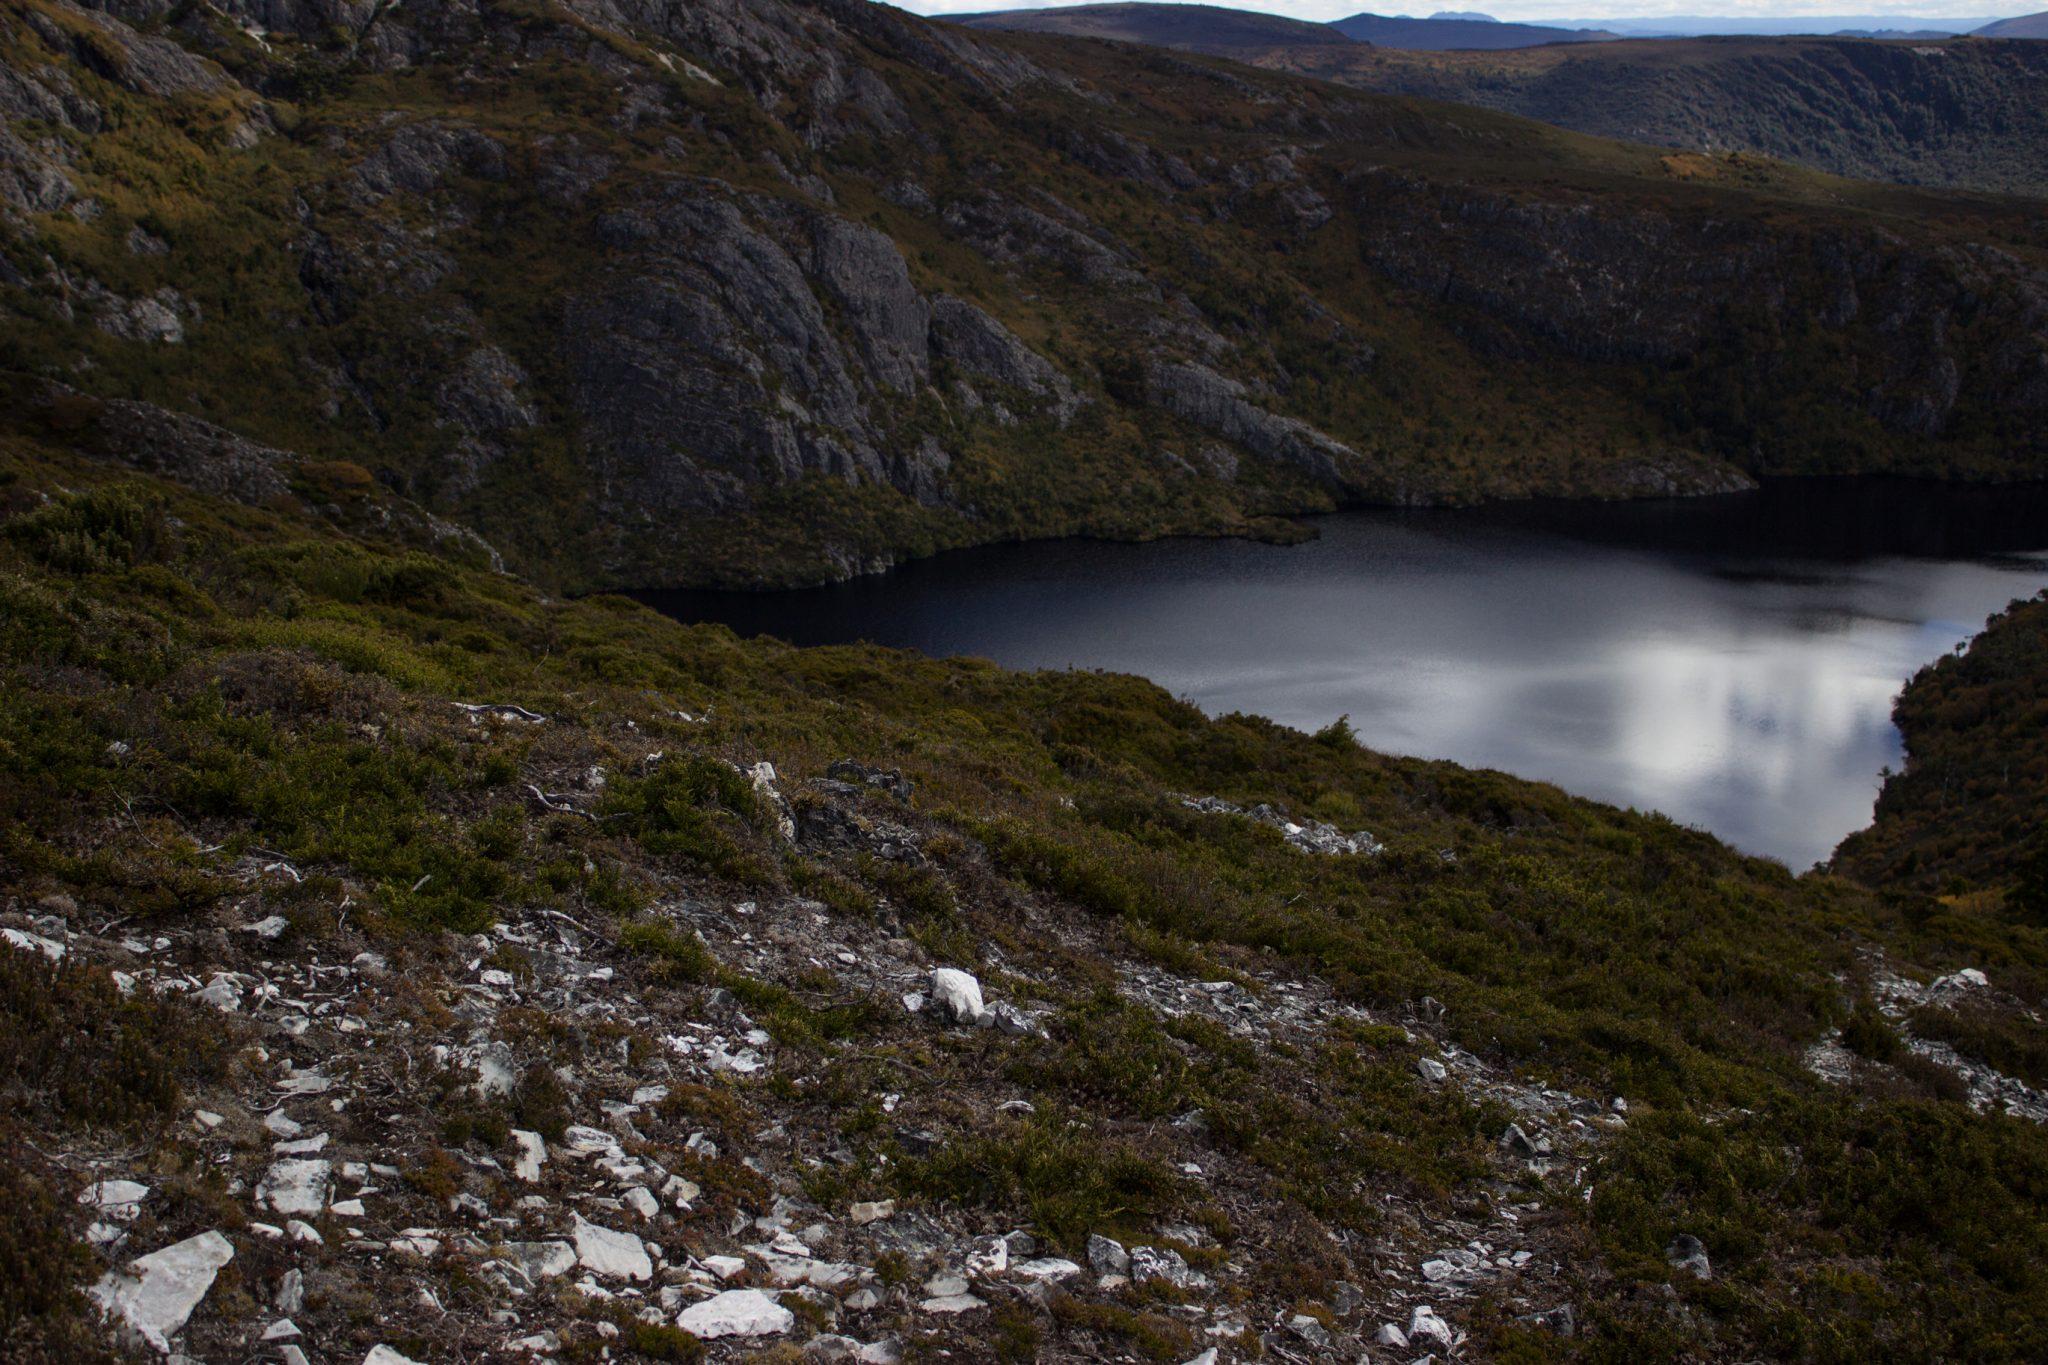 Ronny Creek bis Marions Lookout, Aussichtspunkt, Wanderung Overland Track im Cradle Mountain Lake St. Clair National Park, raue Gebirgslandschaft, schöner See, Ende des Sommers in Tasmanien